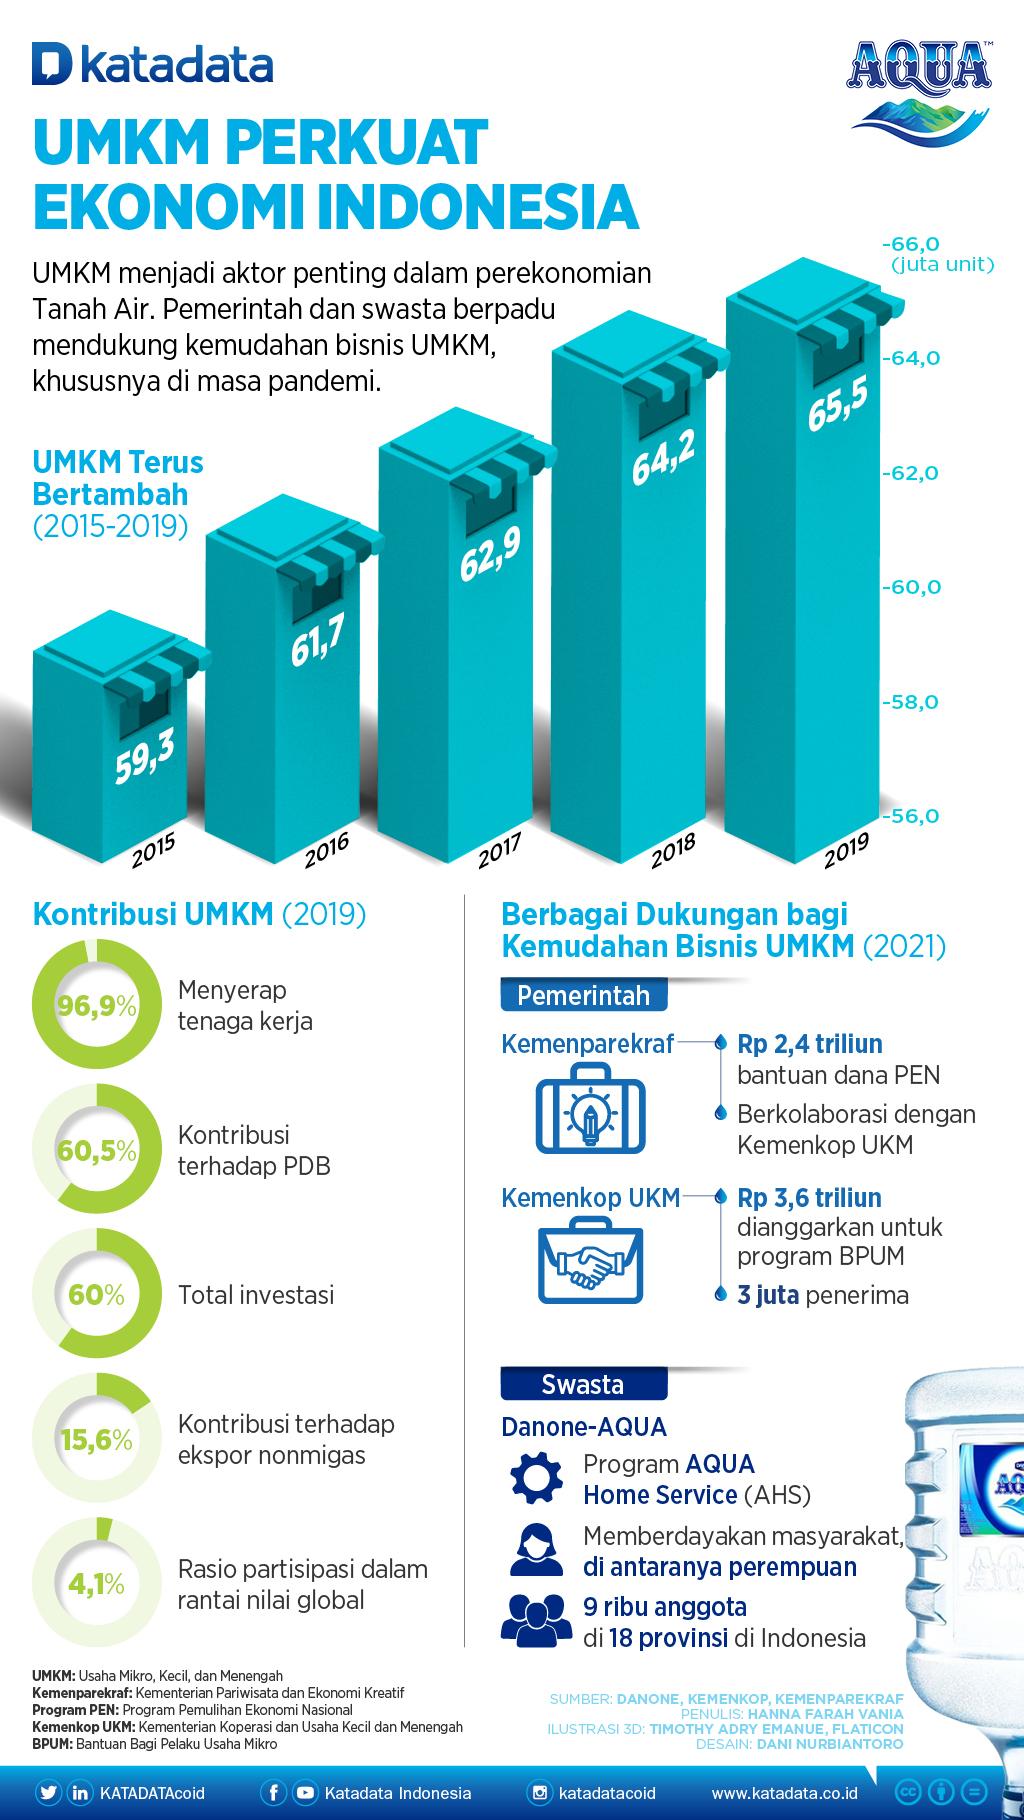 Infografik_Umkm Perkuat Ekonomi Indonesia